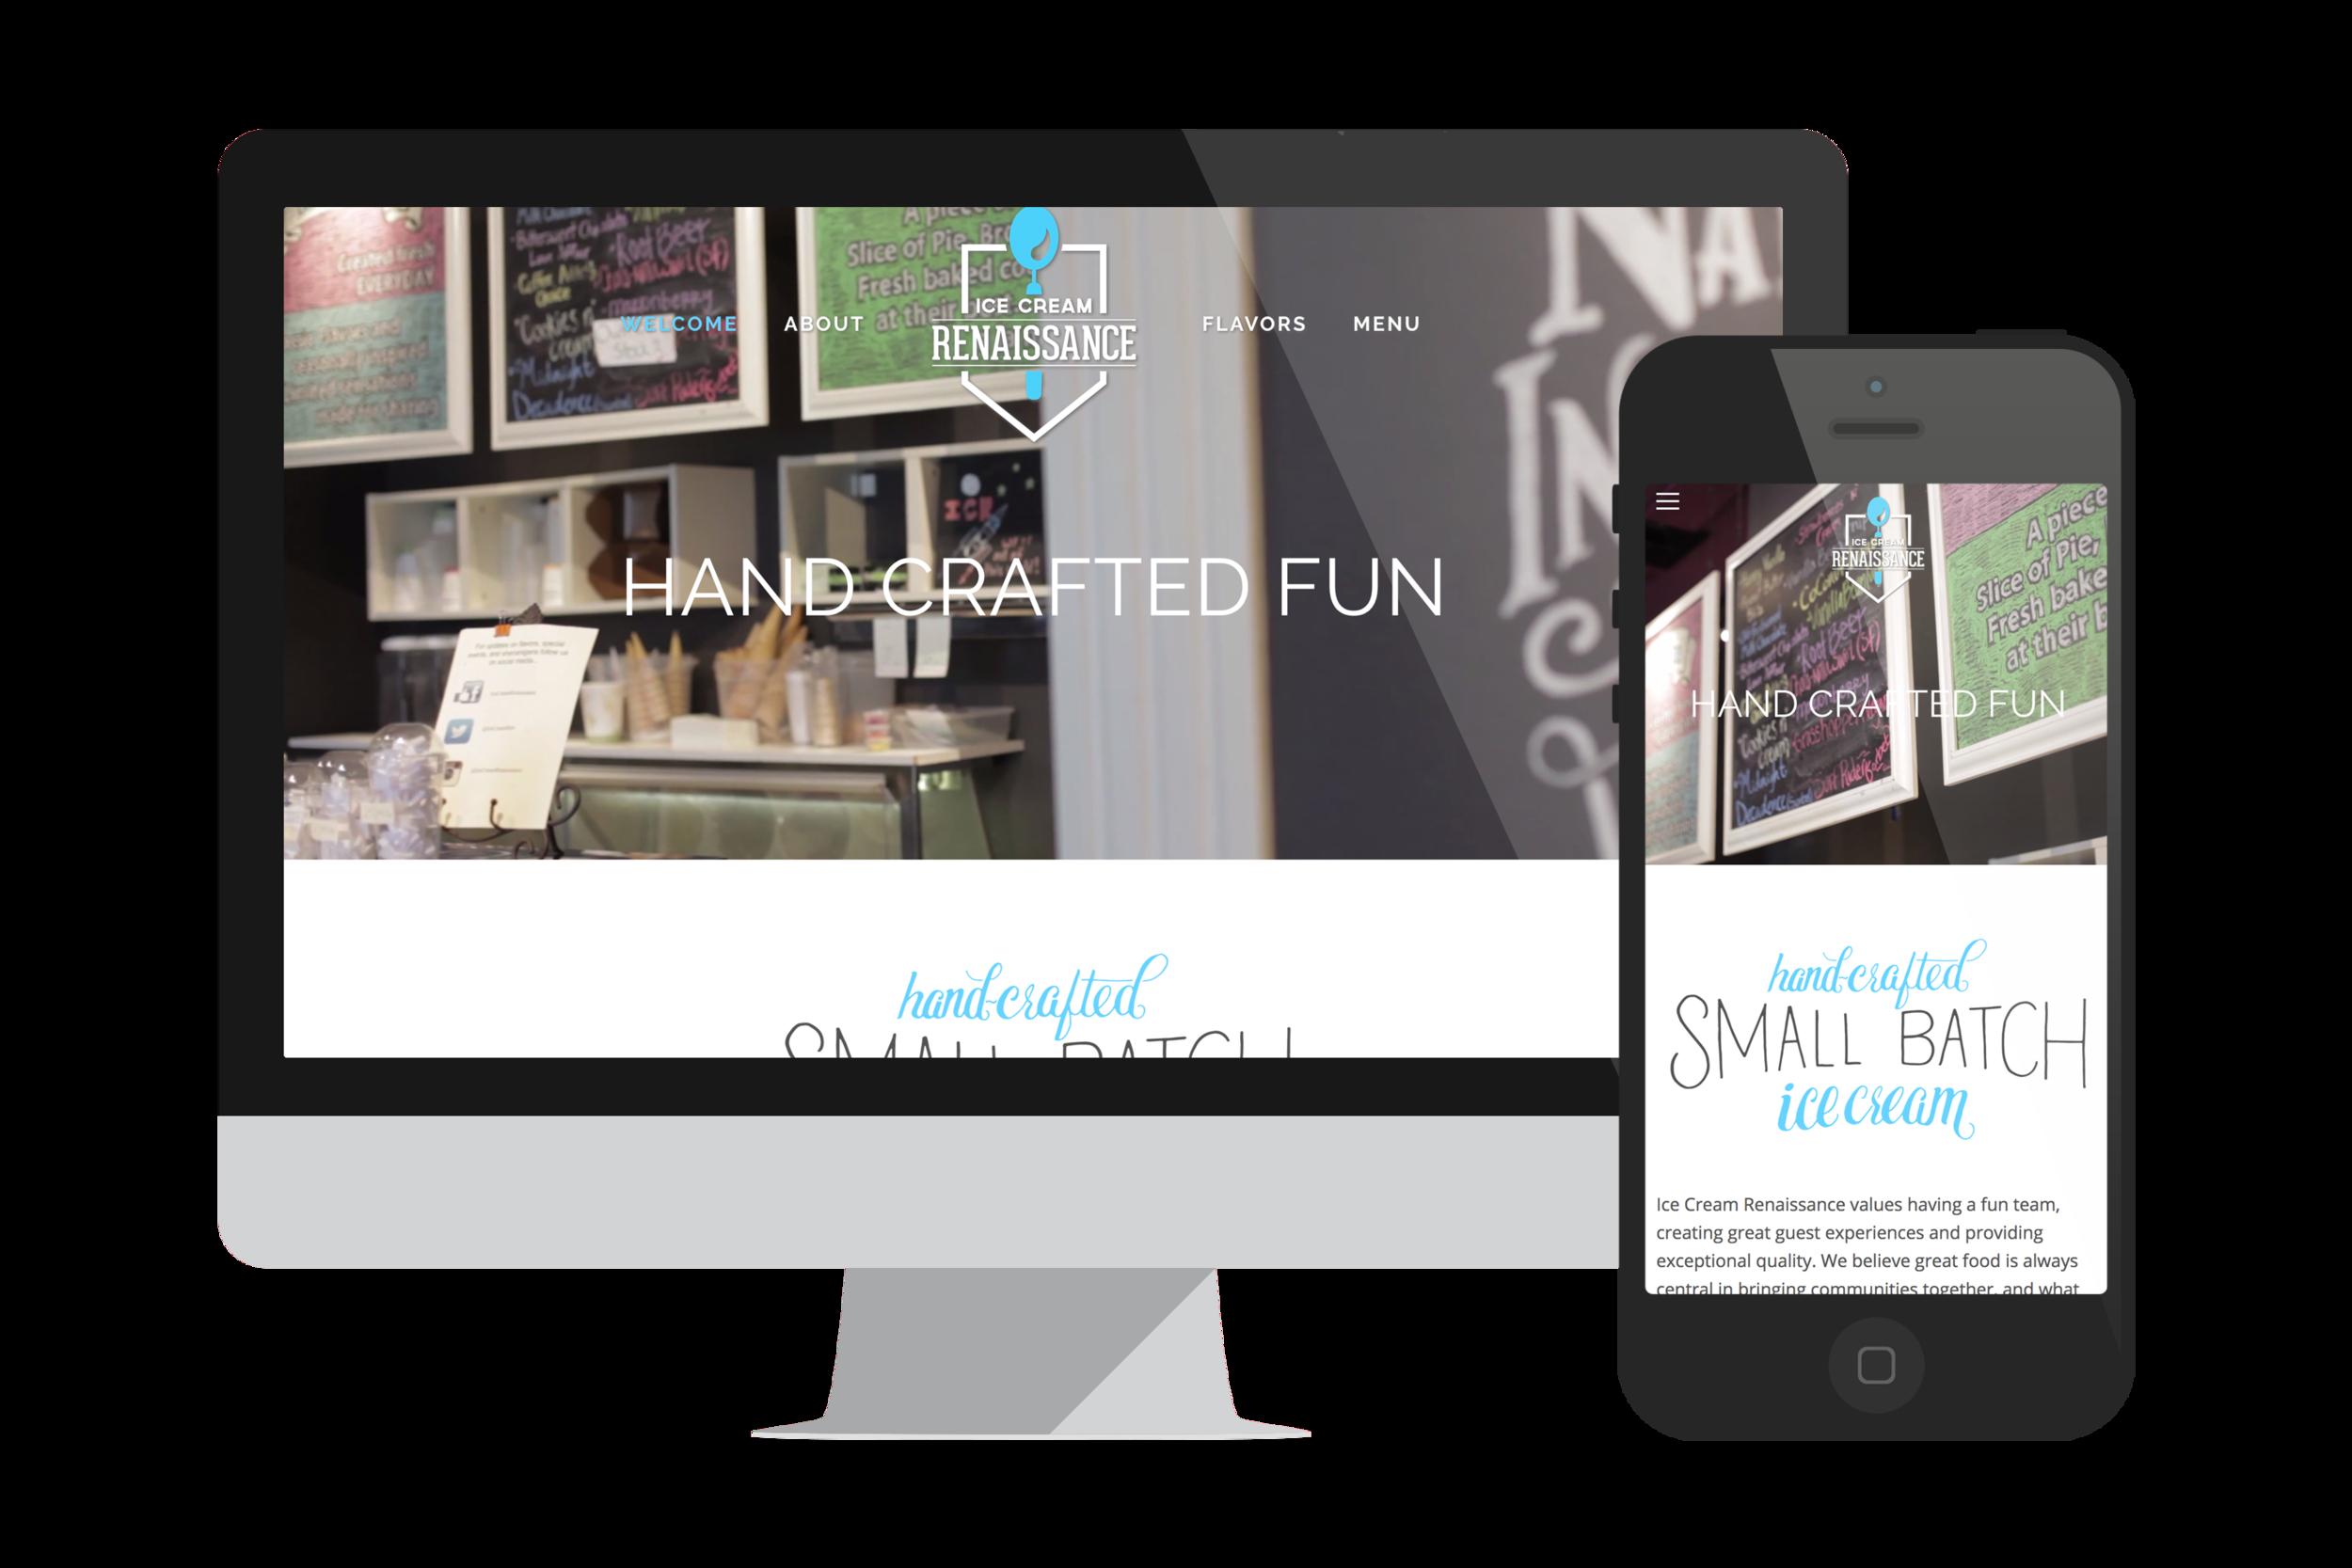 ice-cream-renaissance-website-design.png